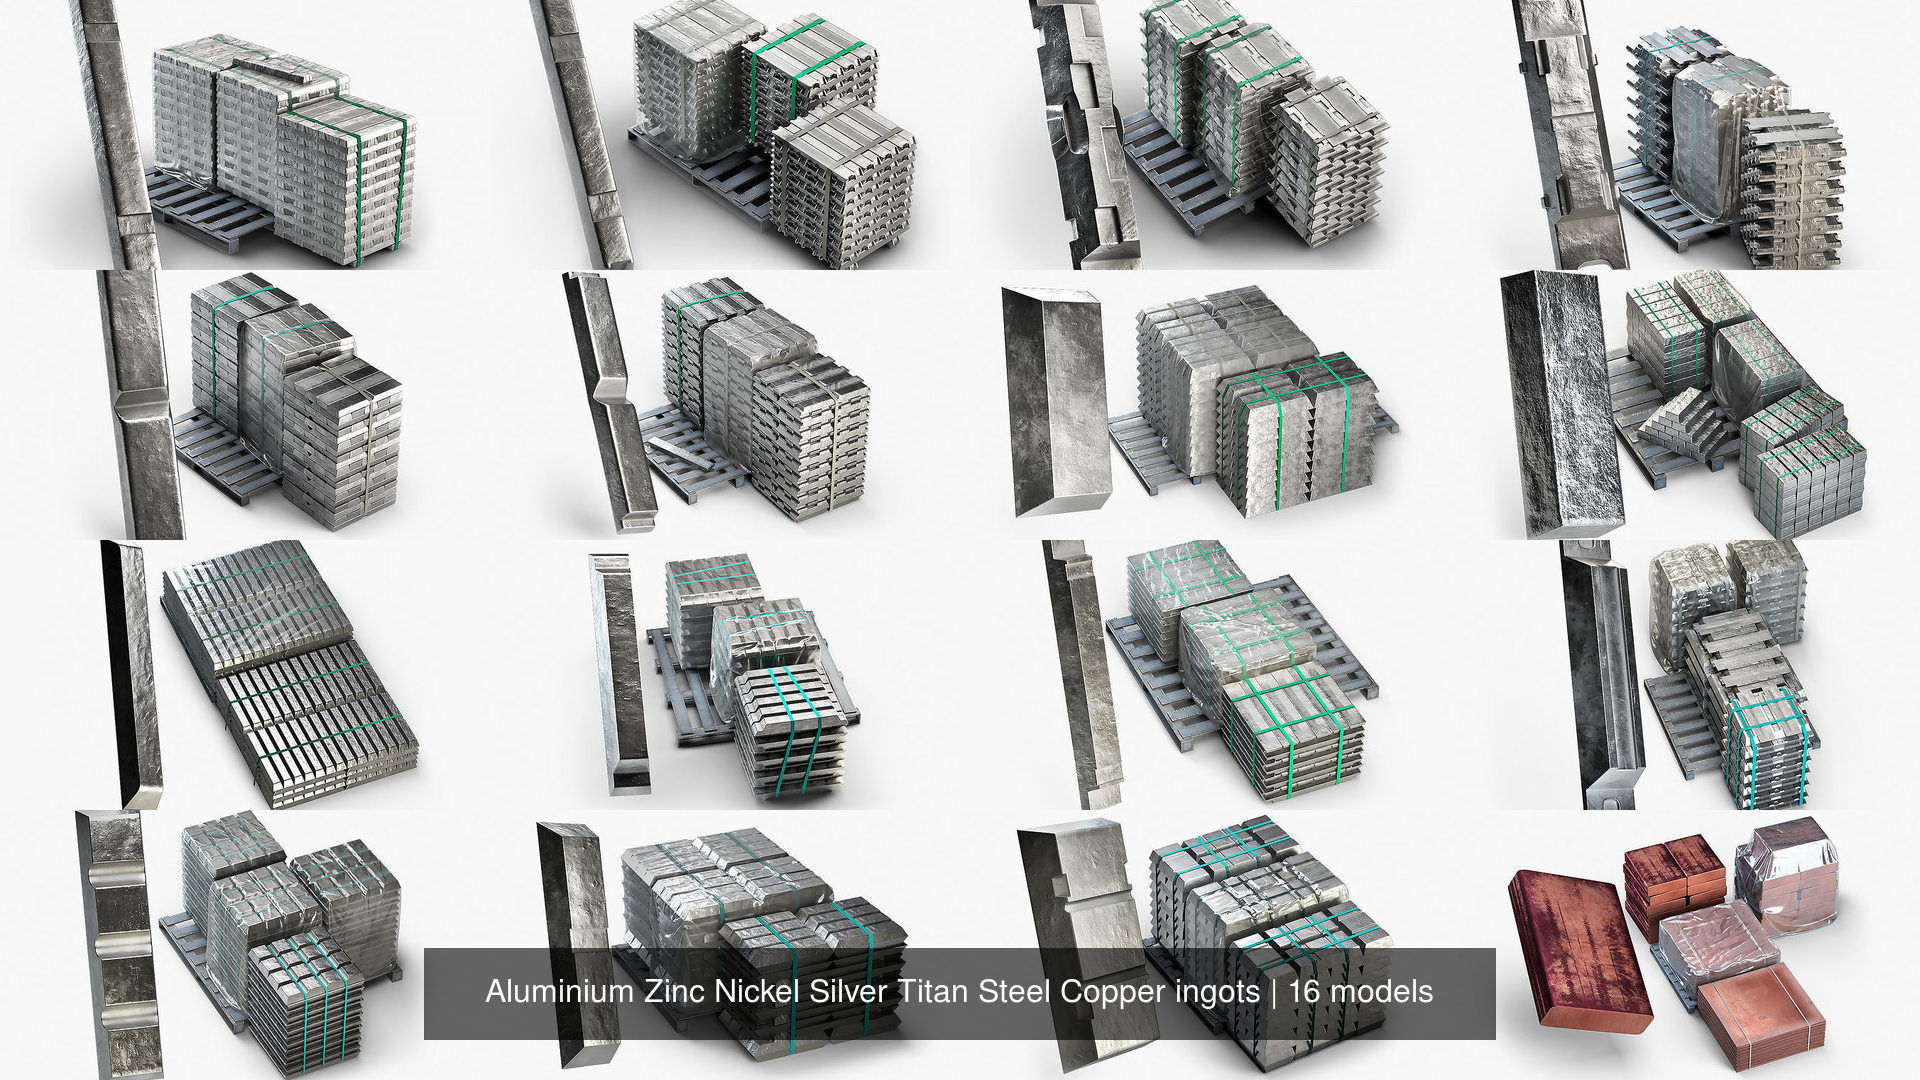 Aluminium Zinc Nickel Silver Titan Steel Copper ingots